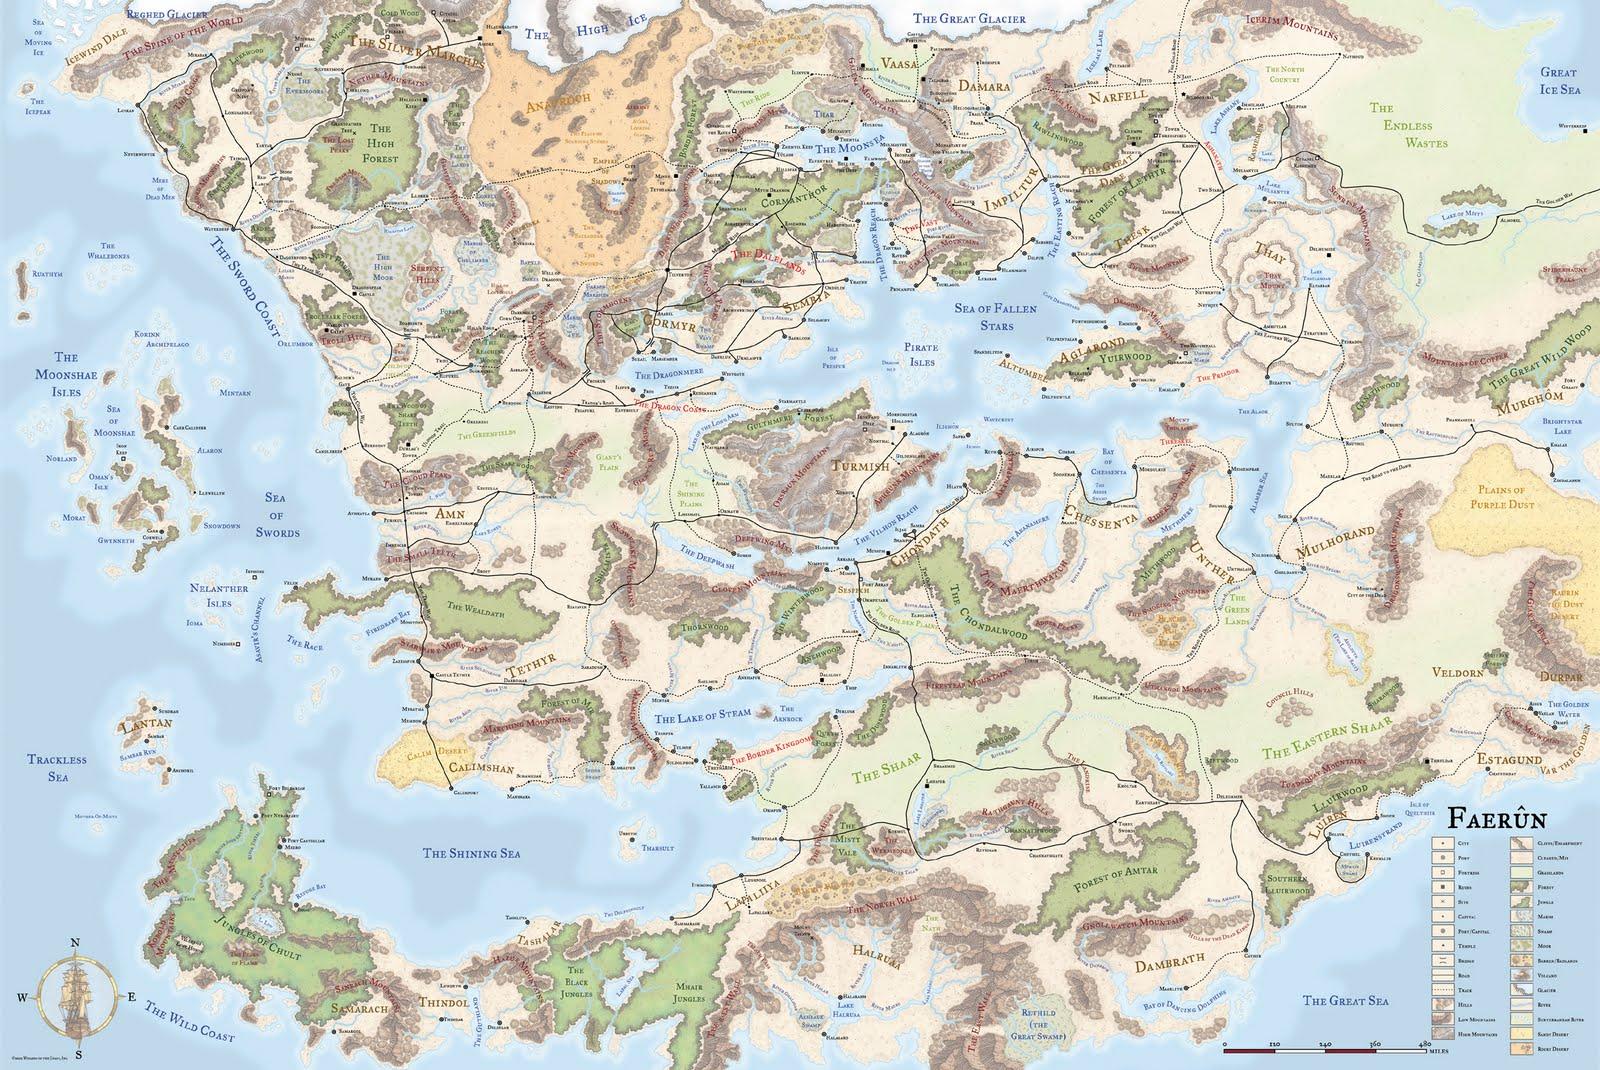 https://i1.wp.com/3.bp.blogspot.com/_SniTwfm5BwE/SwGdTsvt47I/AAAAAAAABzM/k7La6NHPP-o/s1600/Faerun+Map+3rd+Edition.jpg